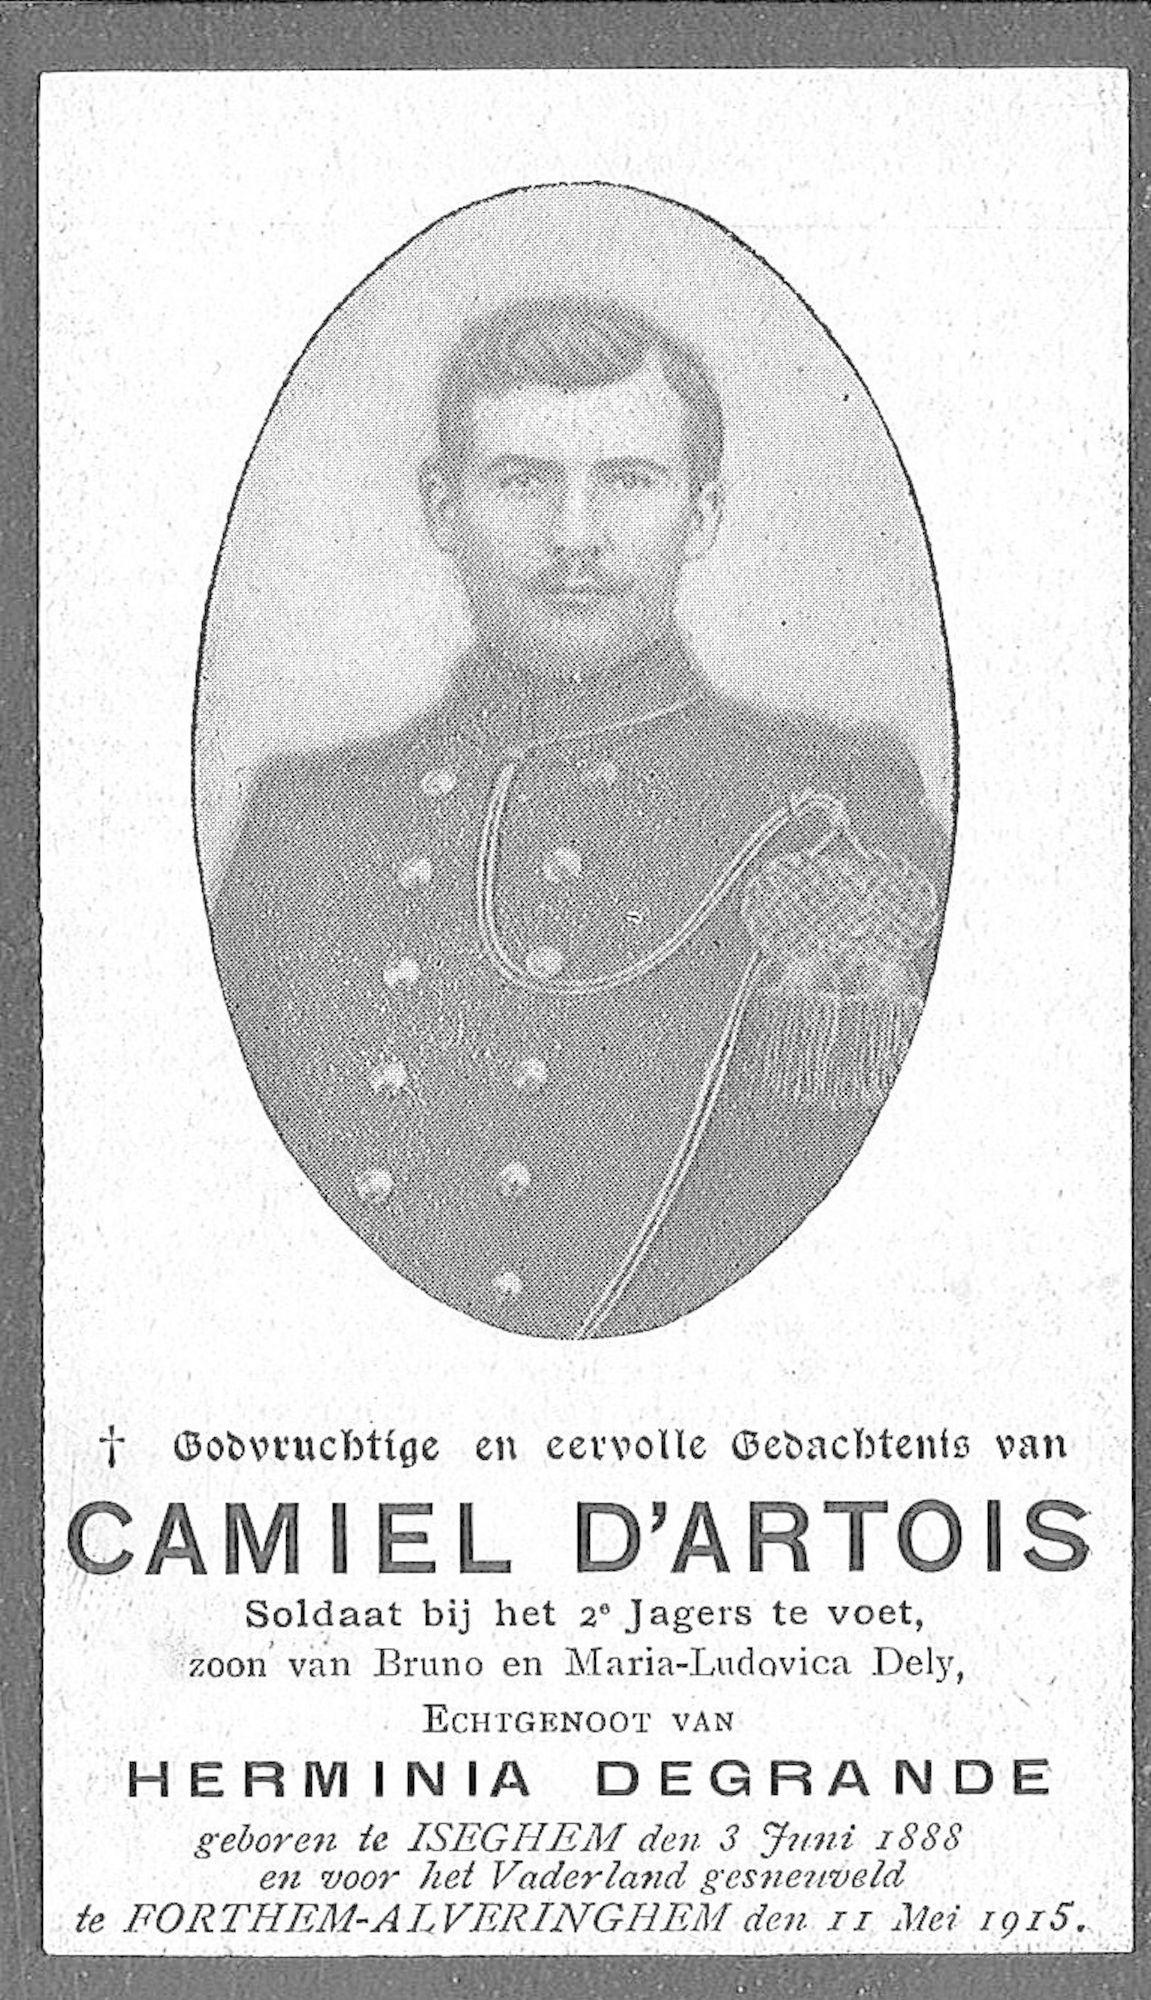 Camiel d'Artois